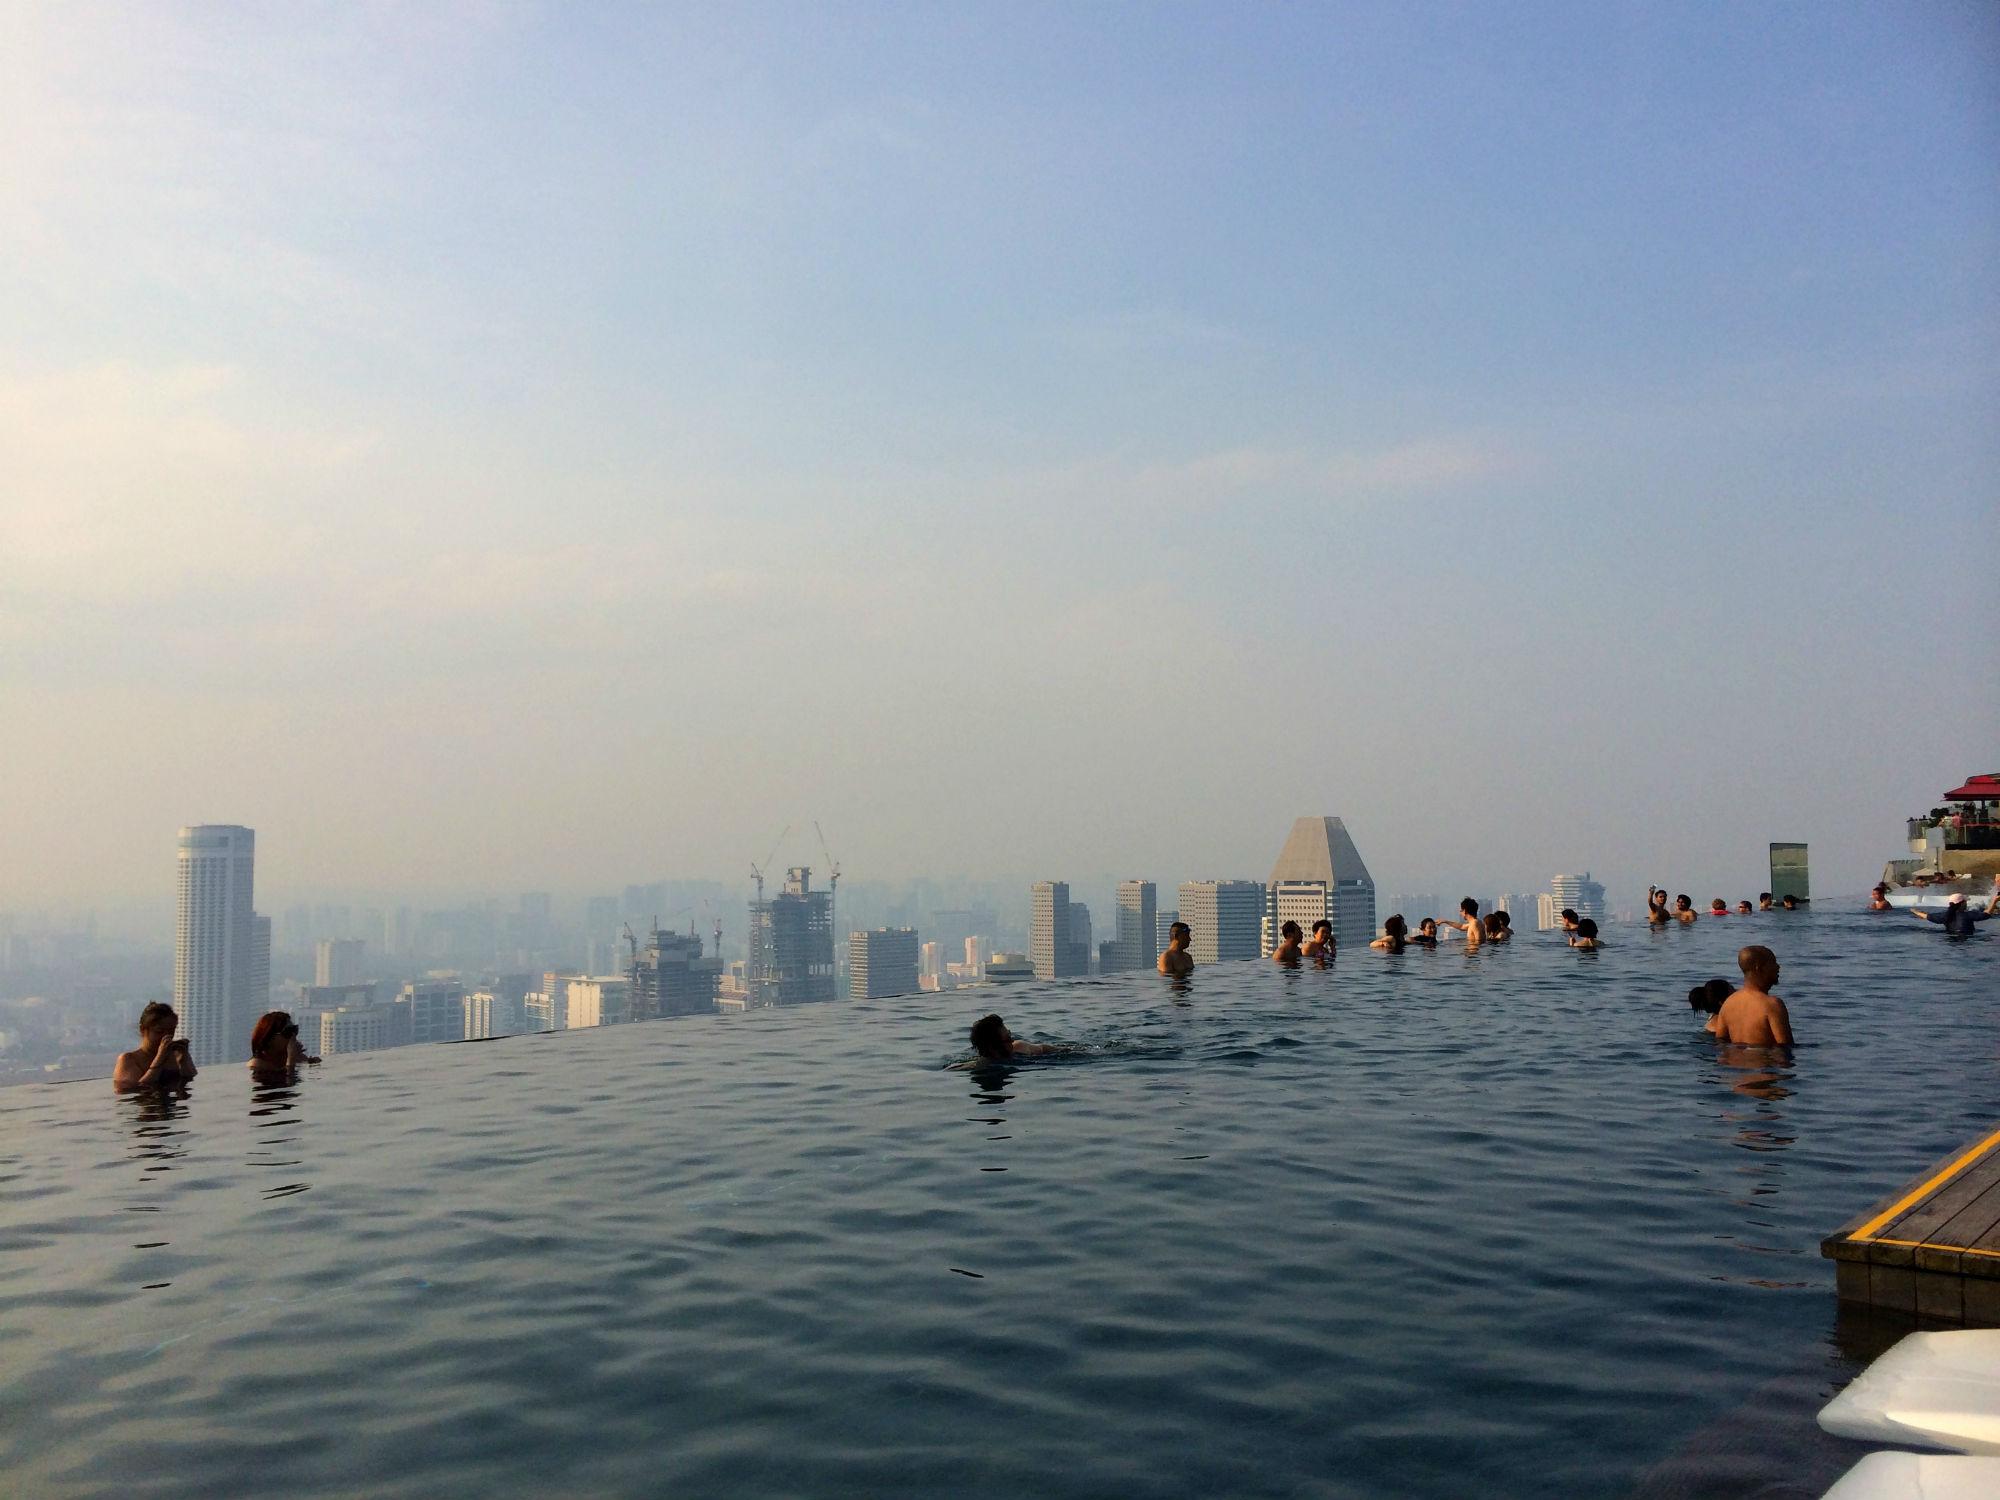 Hotel review marina bay sands singapore - Marina bay sands infinity pool ...